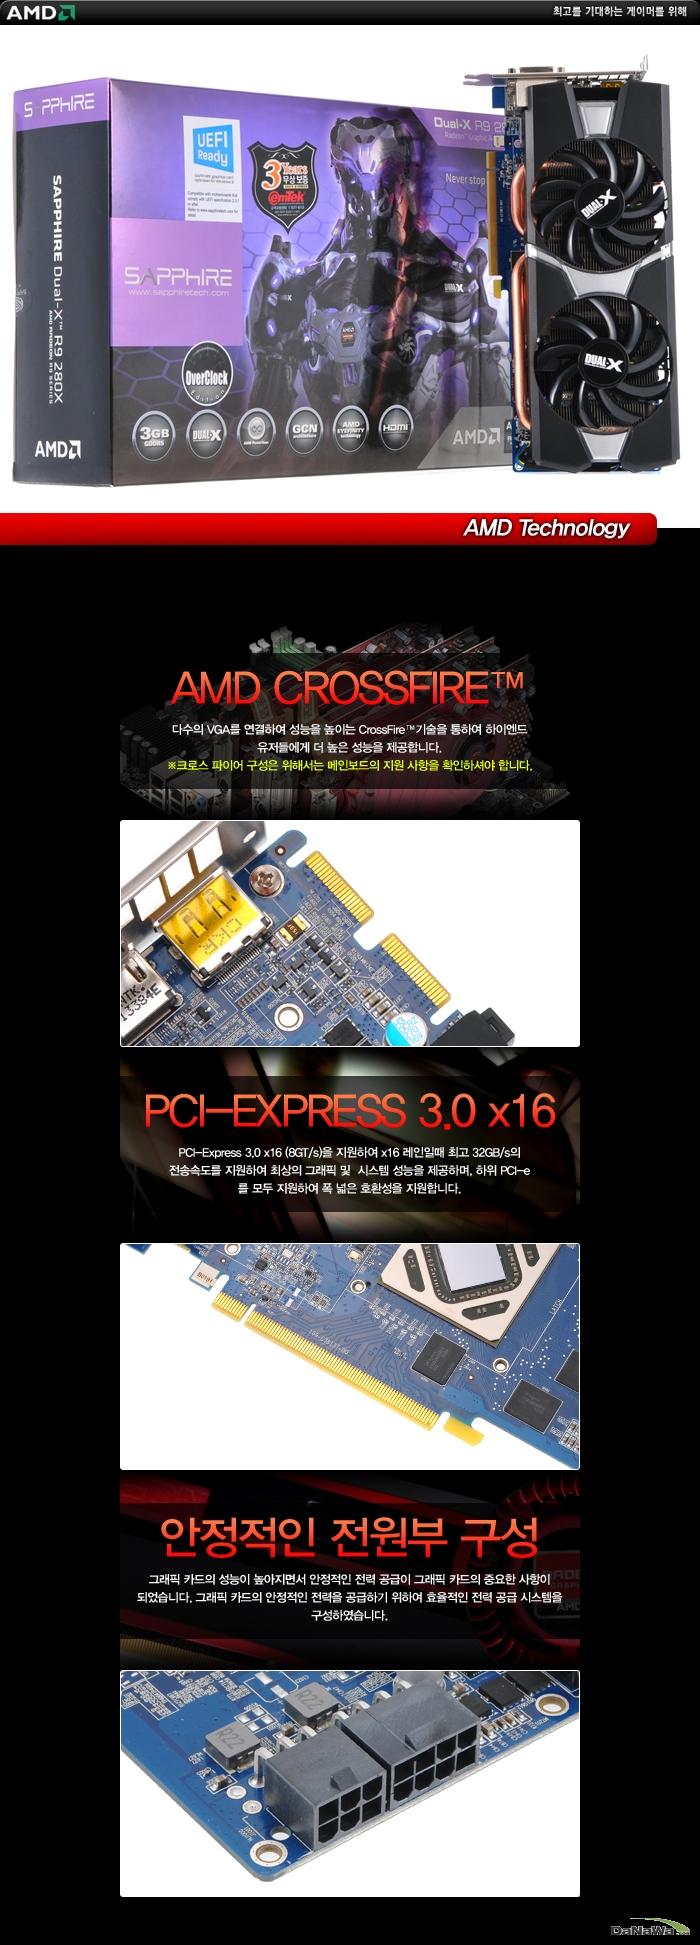 SAPPHIRE 라데온 R9 280X OC D5 3GB Dual-X의 기술정보